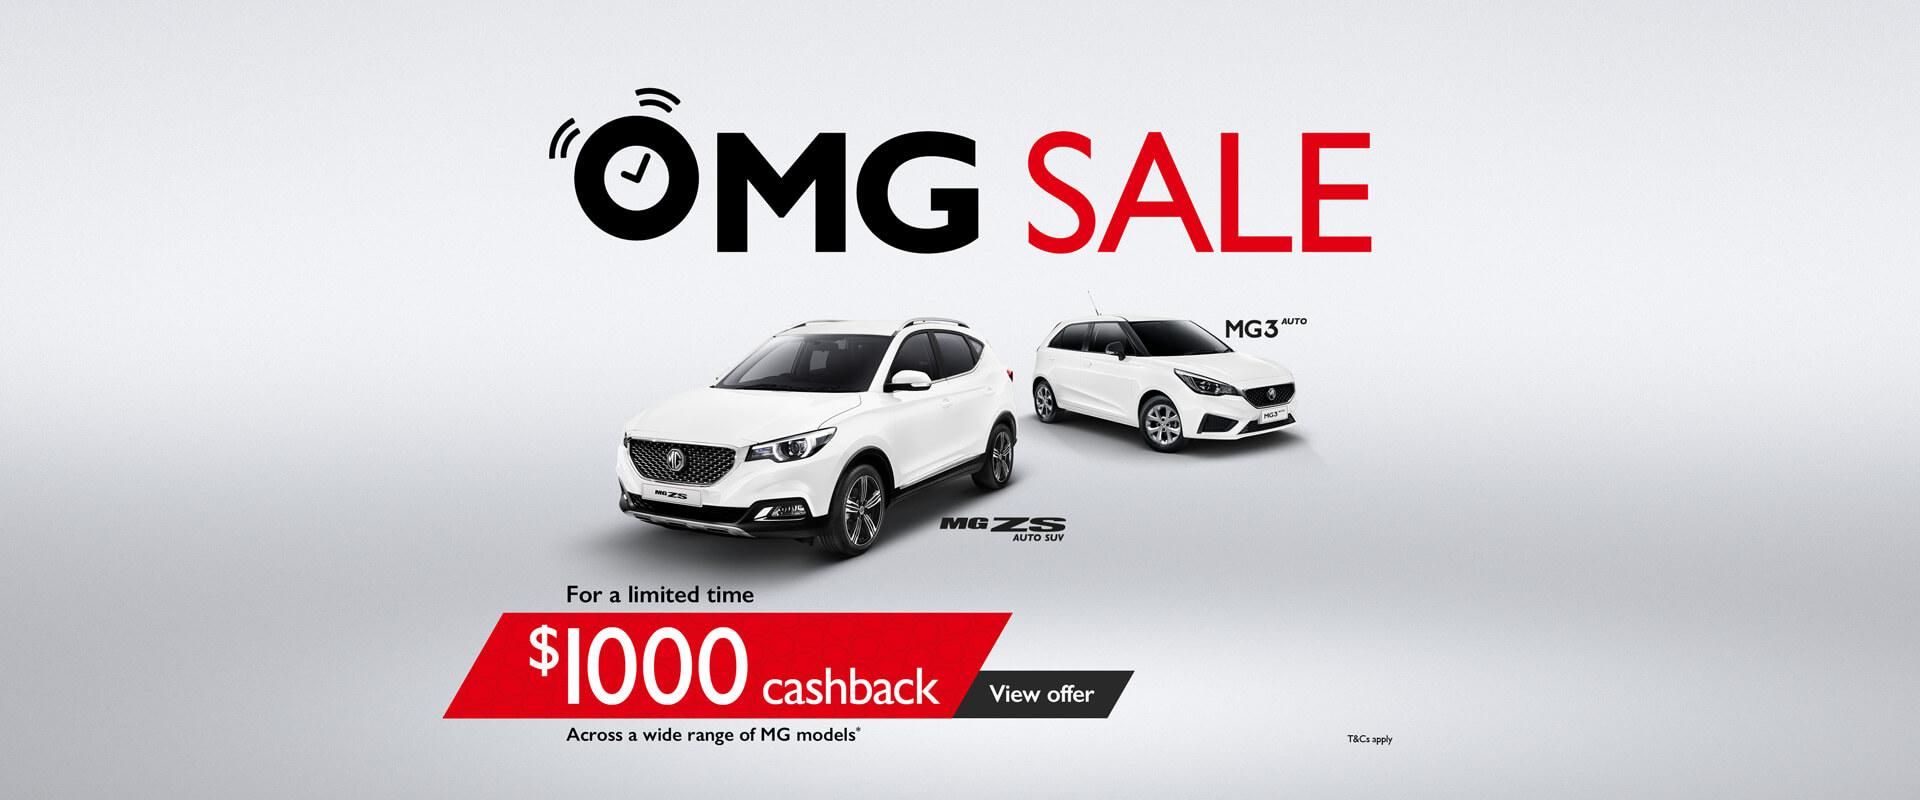 MG OMG Sale $1000 Cashback for a limited time